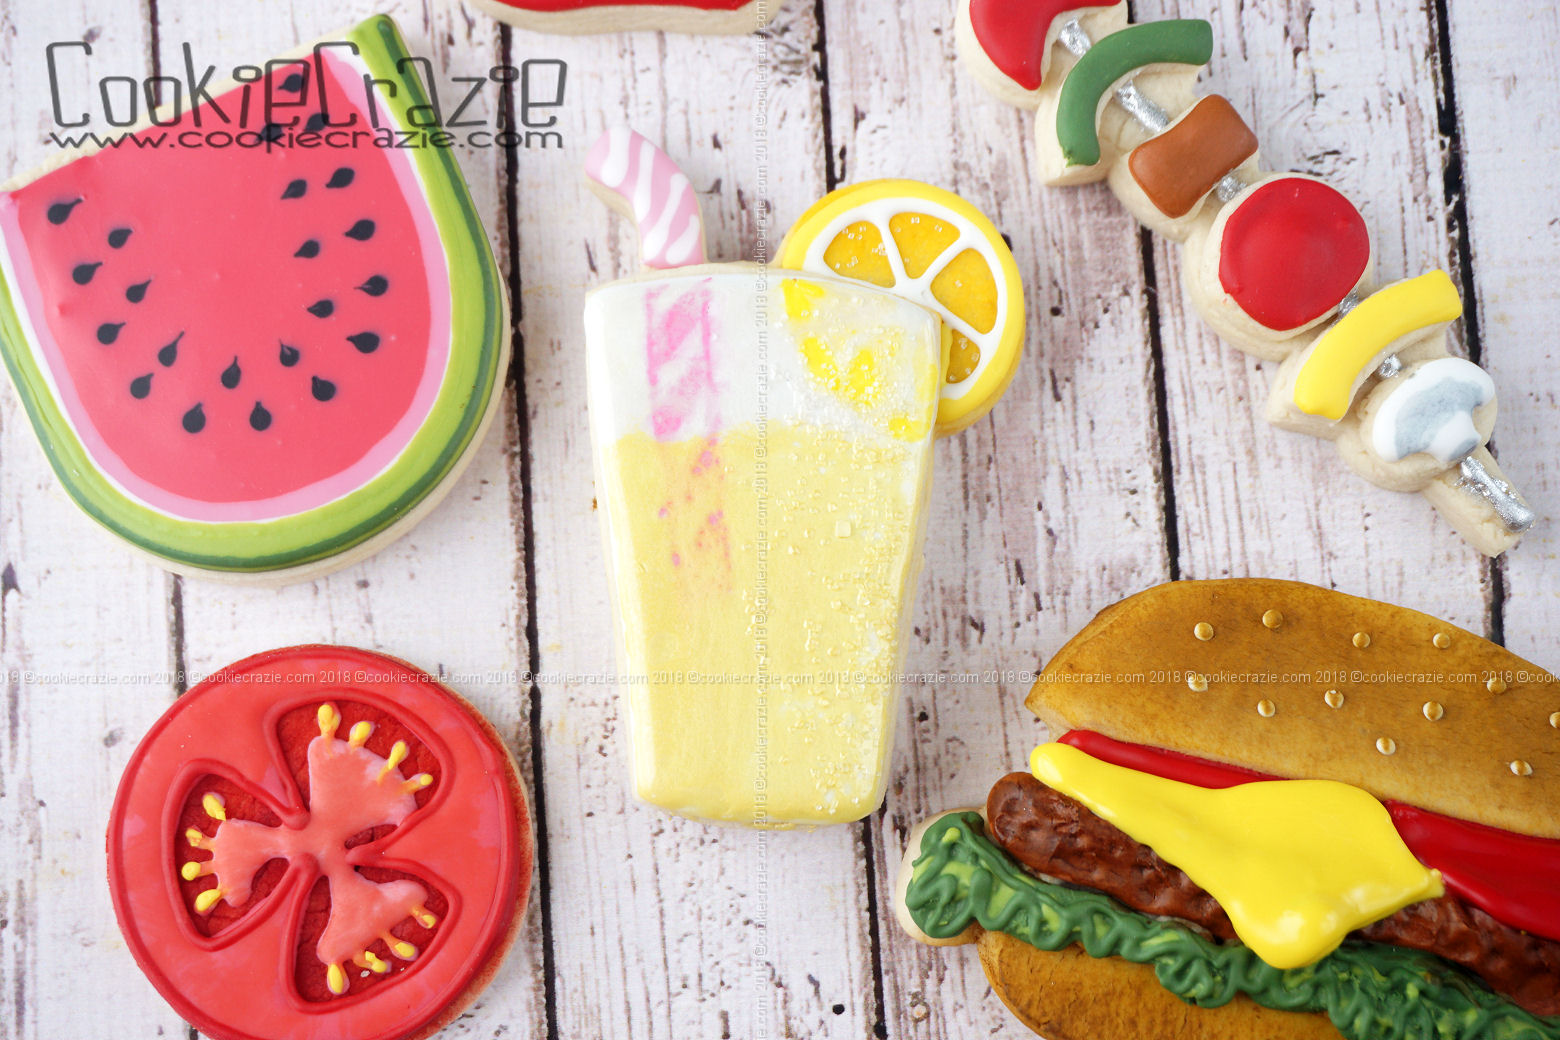 Lemonade Decorated Sugar Cookie YouTube video  HERE